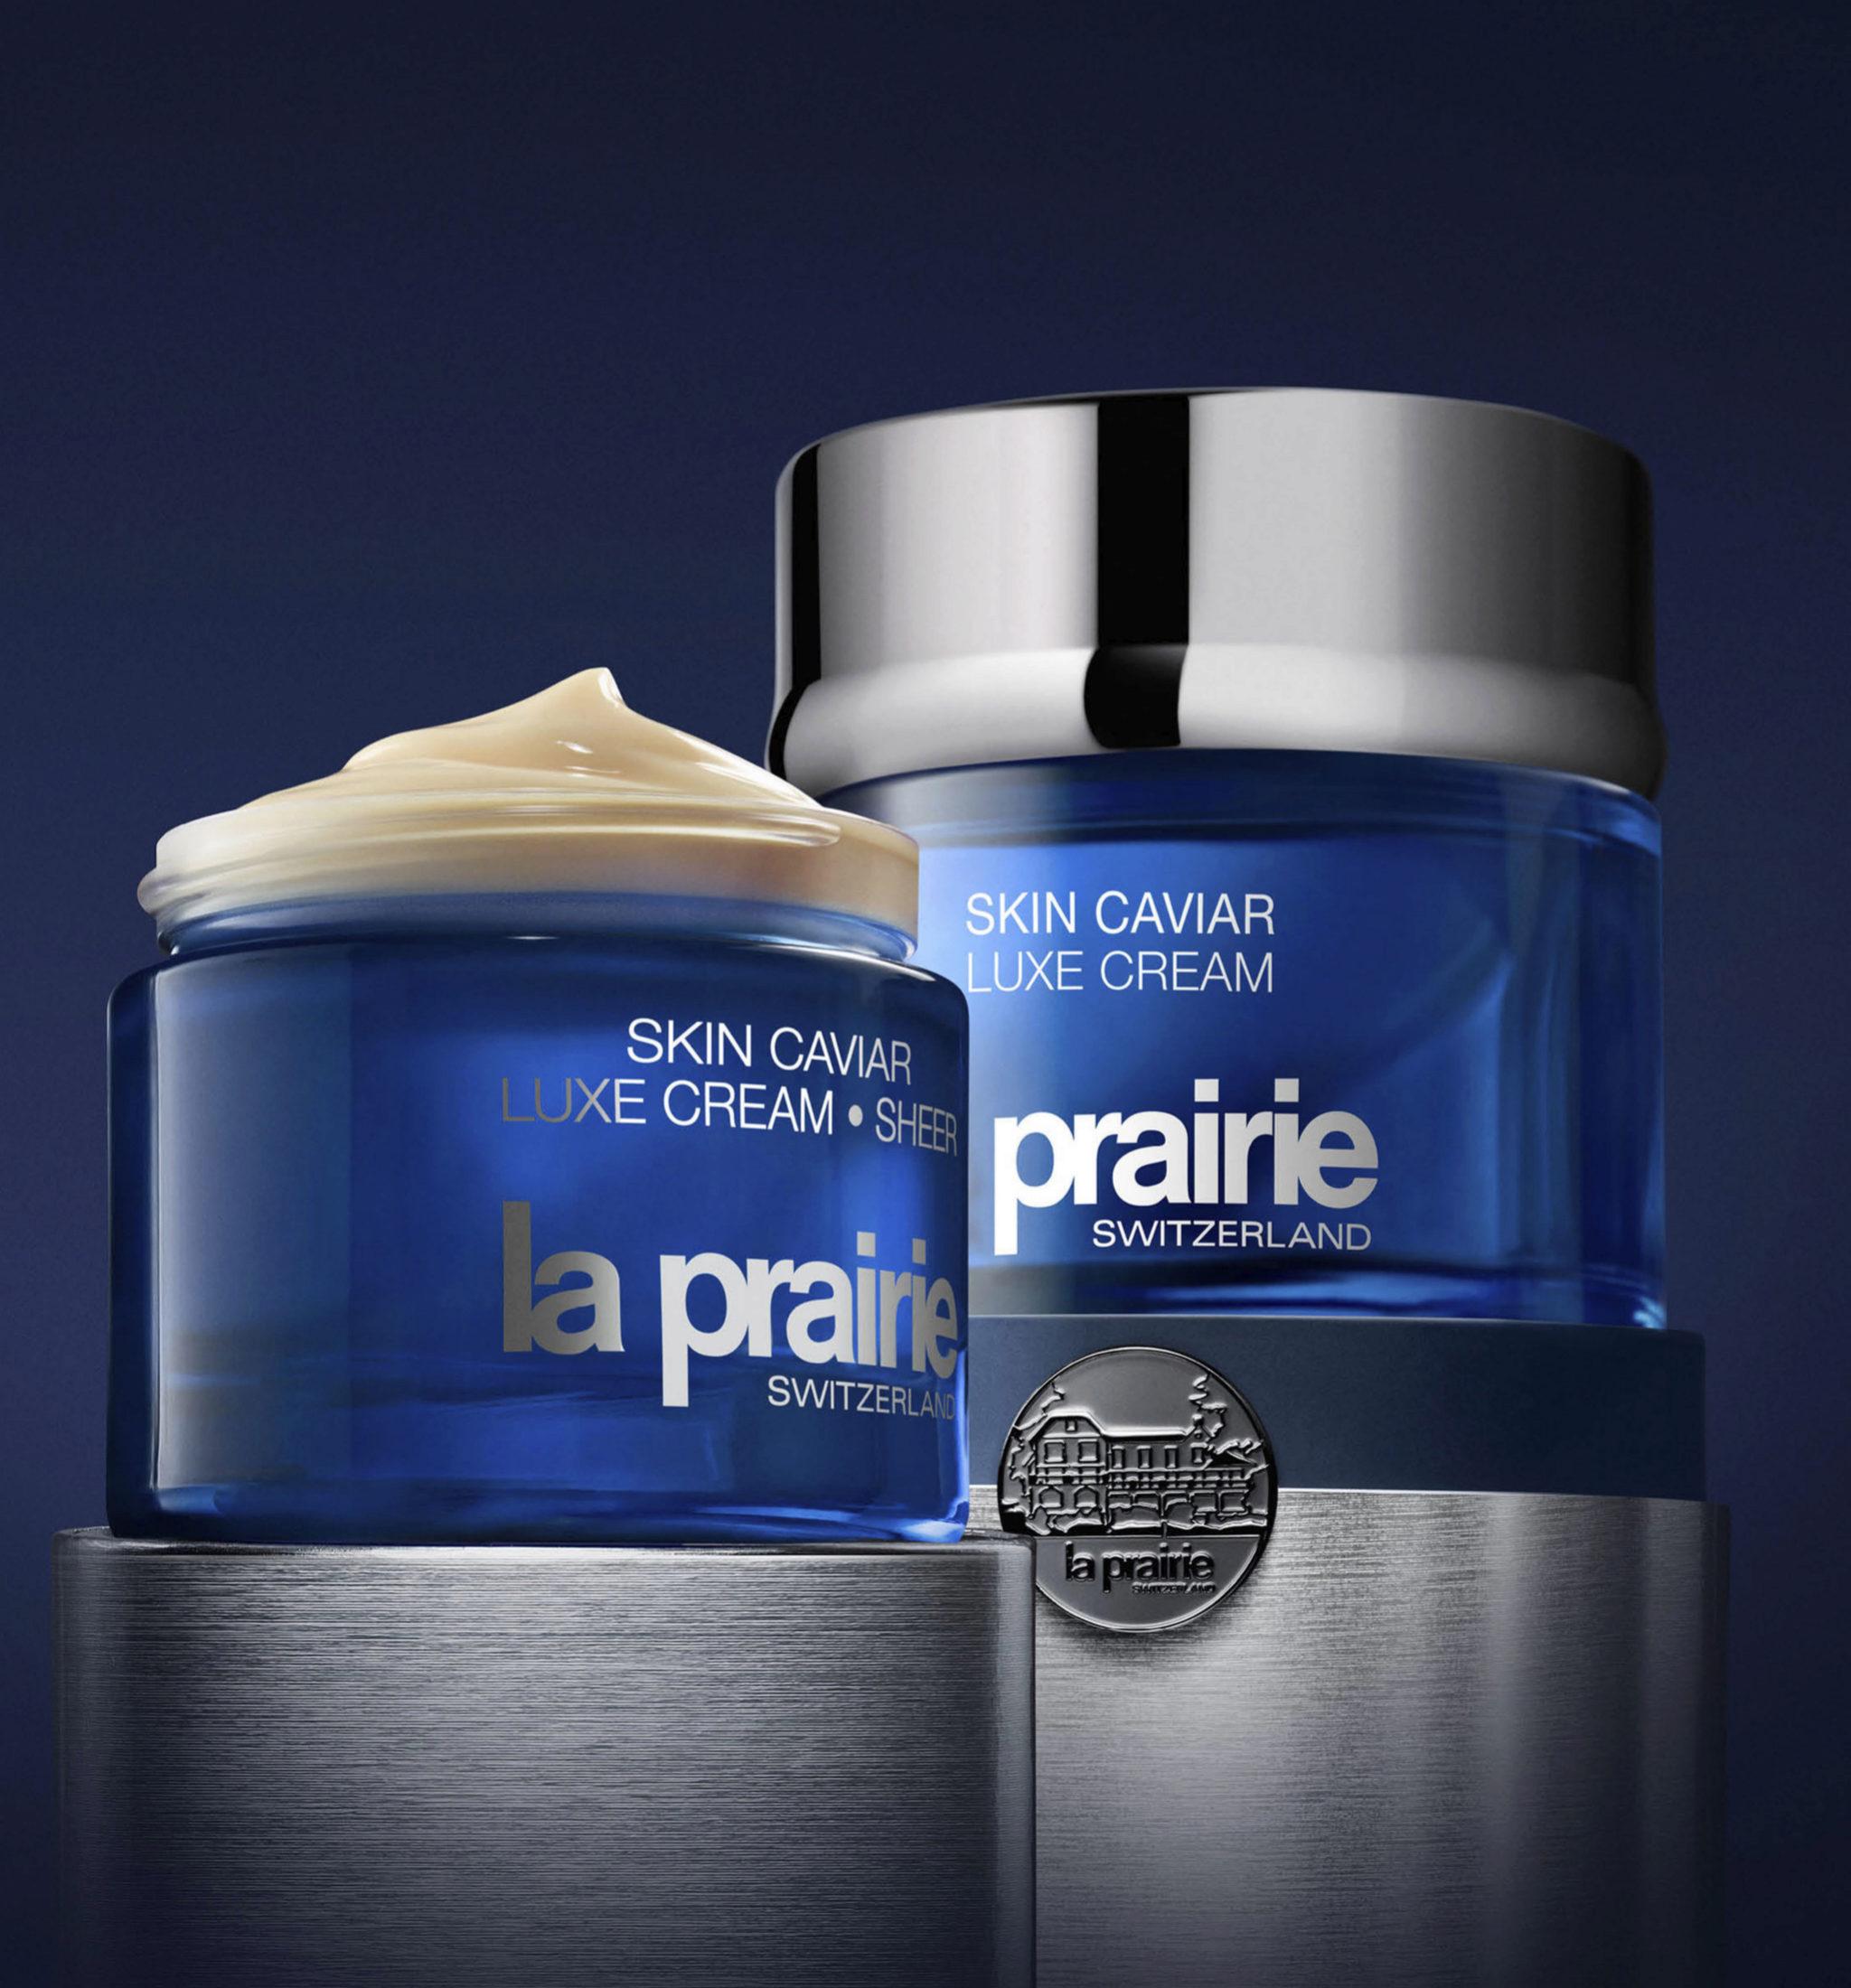 Skin Caviar Luxe Cream enriquecida con Caviar Premier.